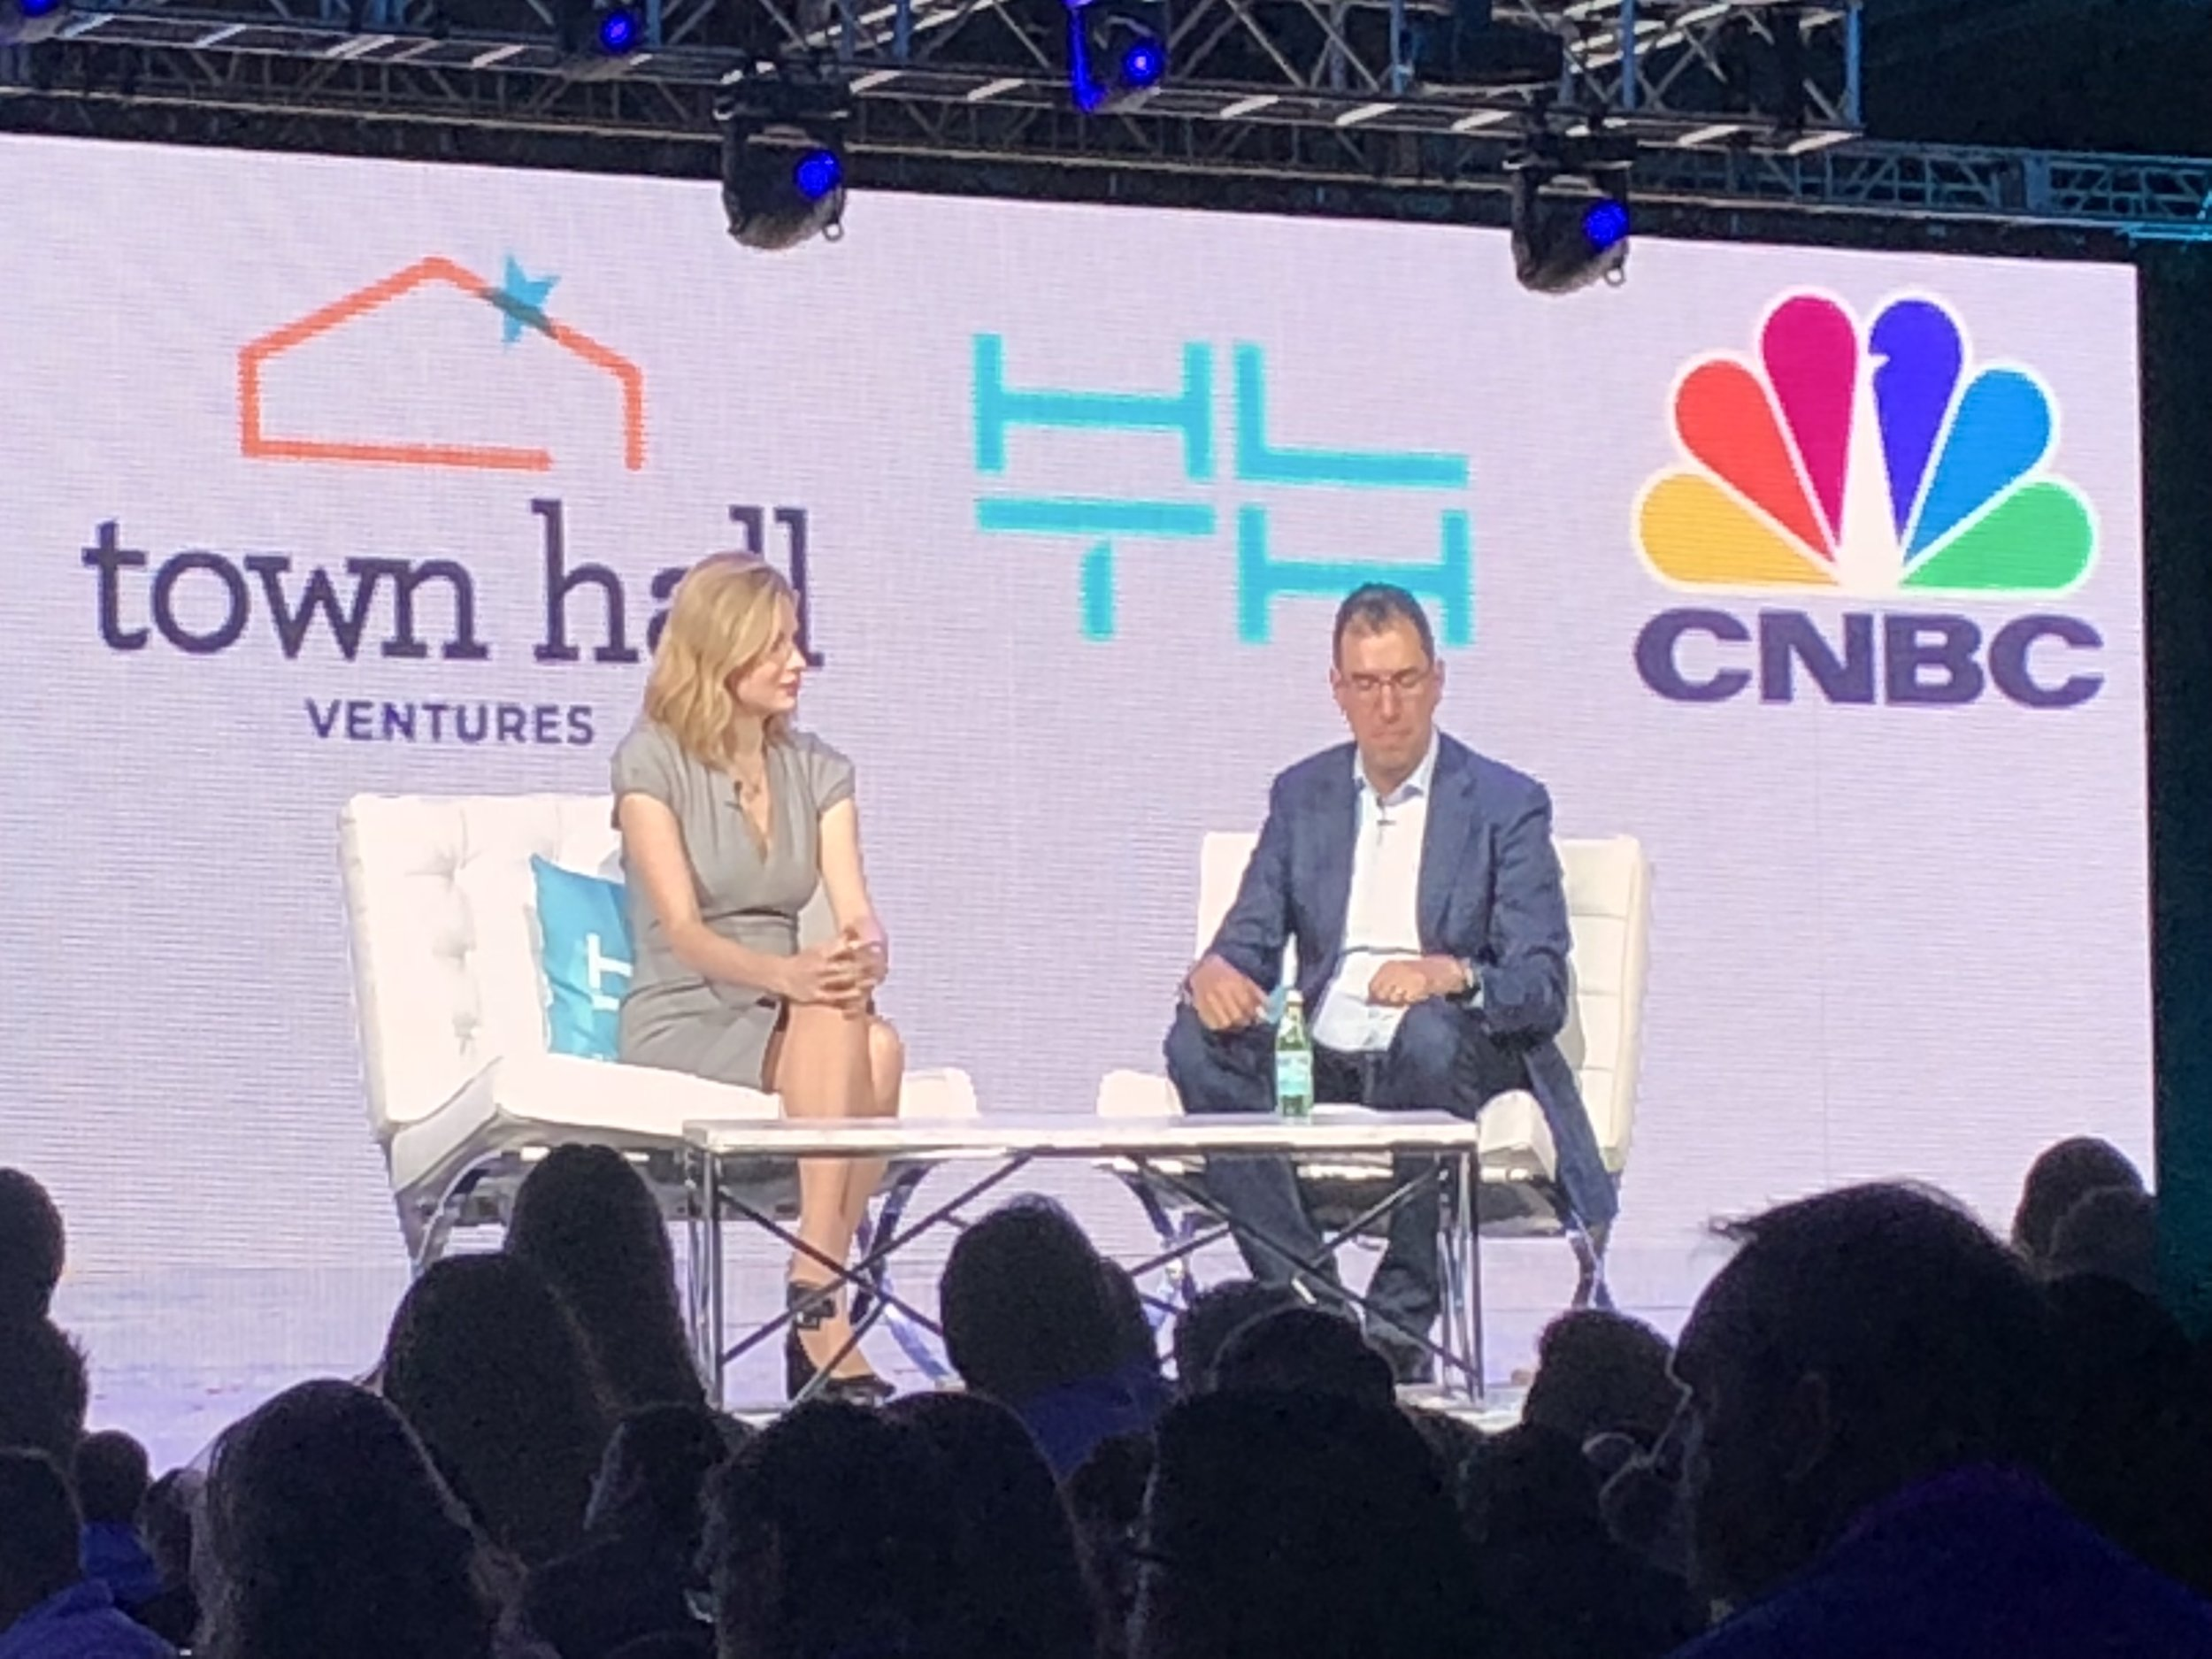 Chrissy Farr  (CNBC) interviews  andy slavitt  (Founder/GP, Town Hall Ventures)